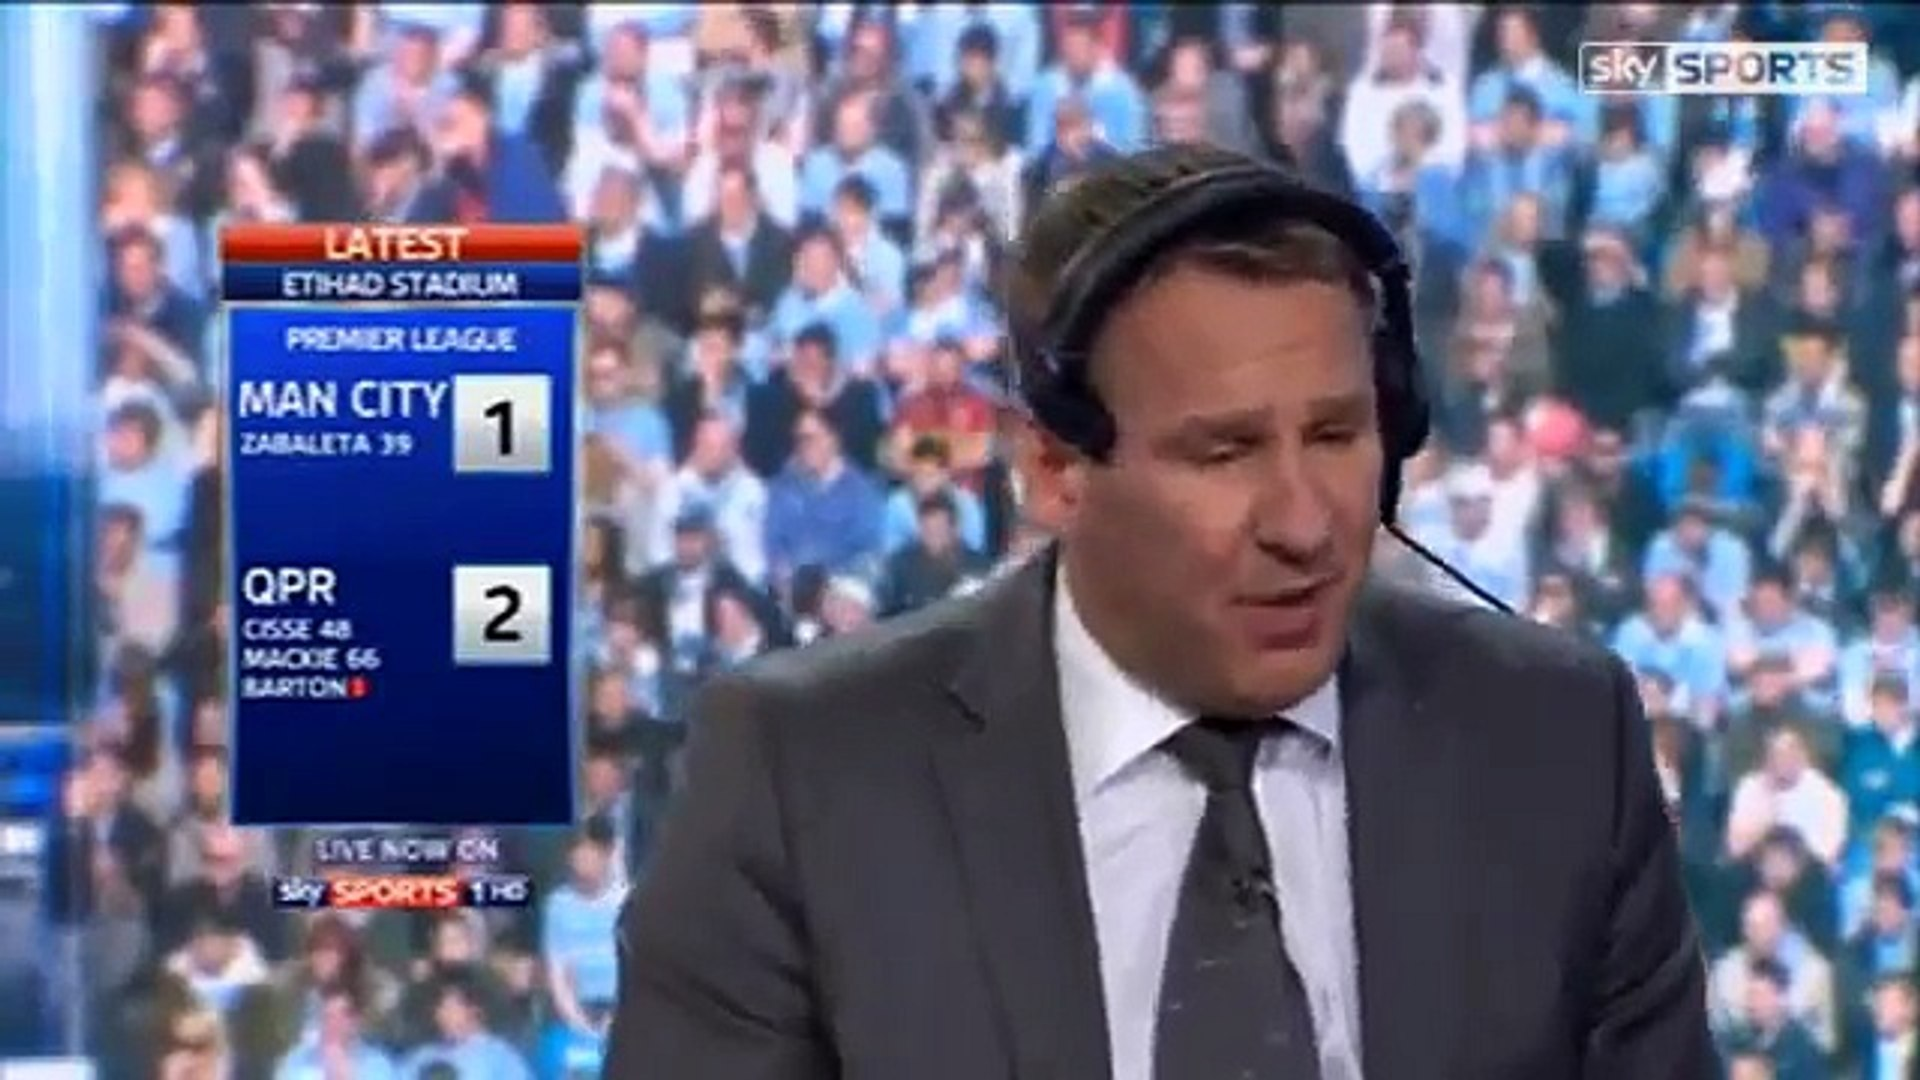 Manchester City vs QPR 3-2 Paul Merson Reaction On Sky Sports News